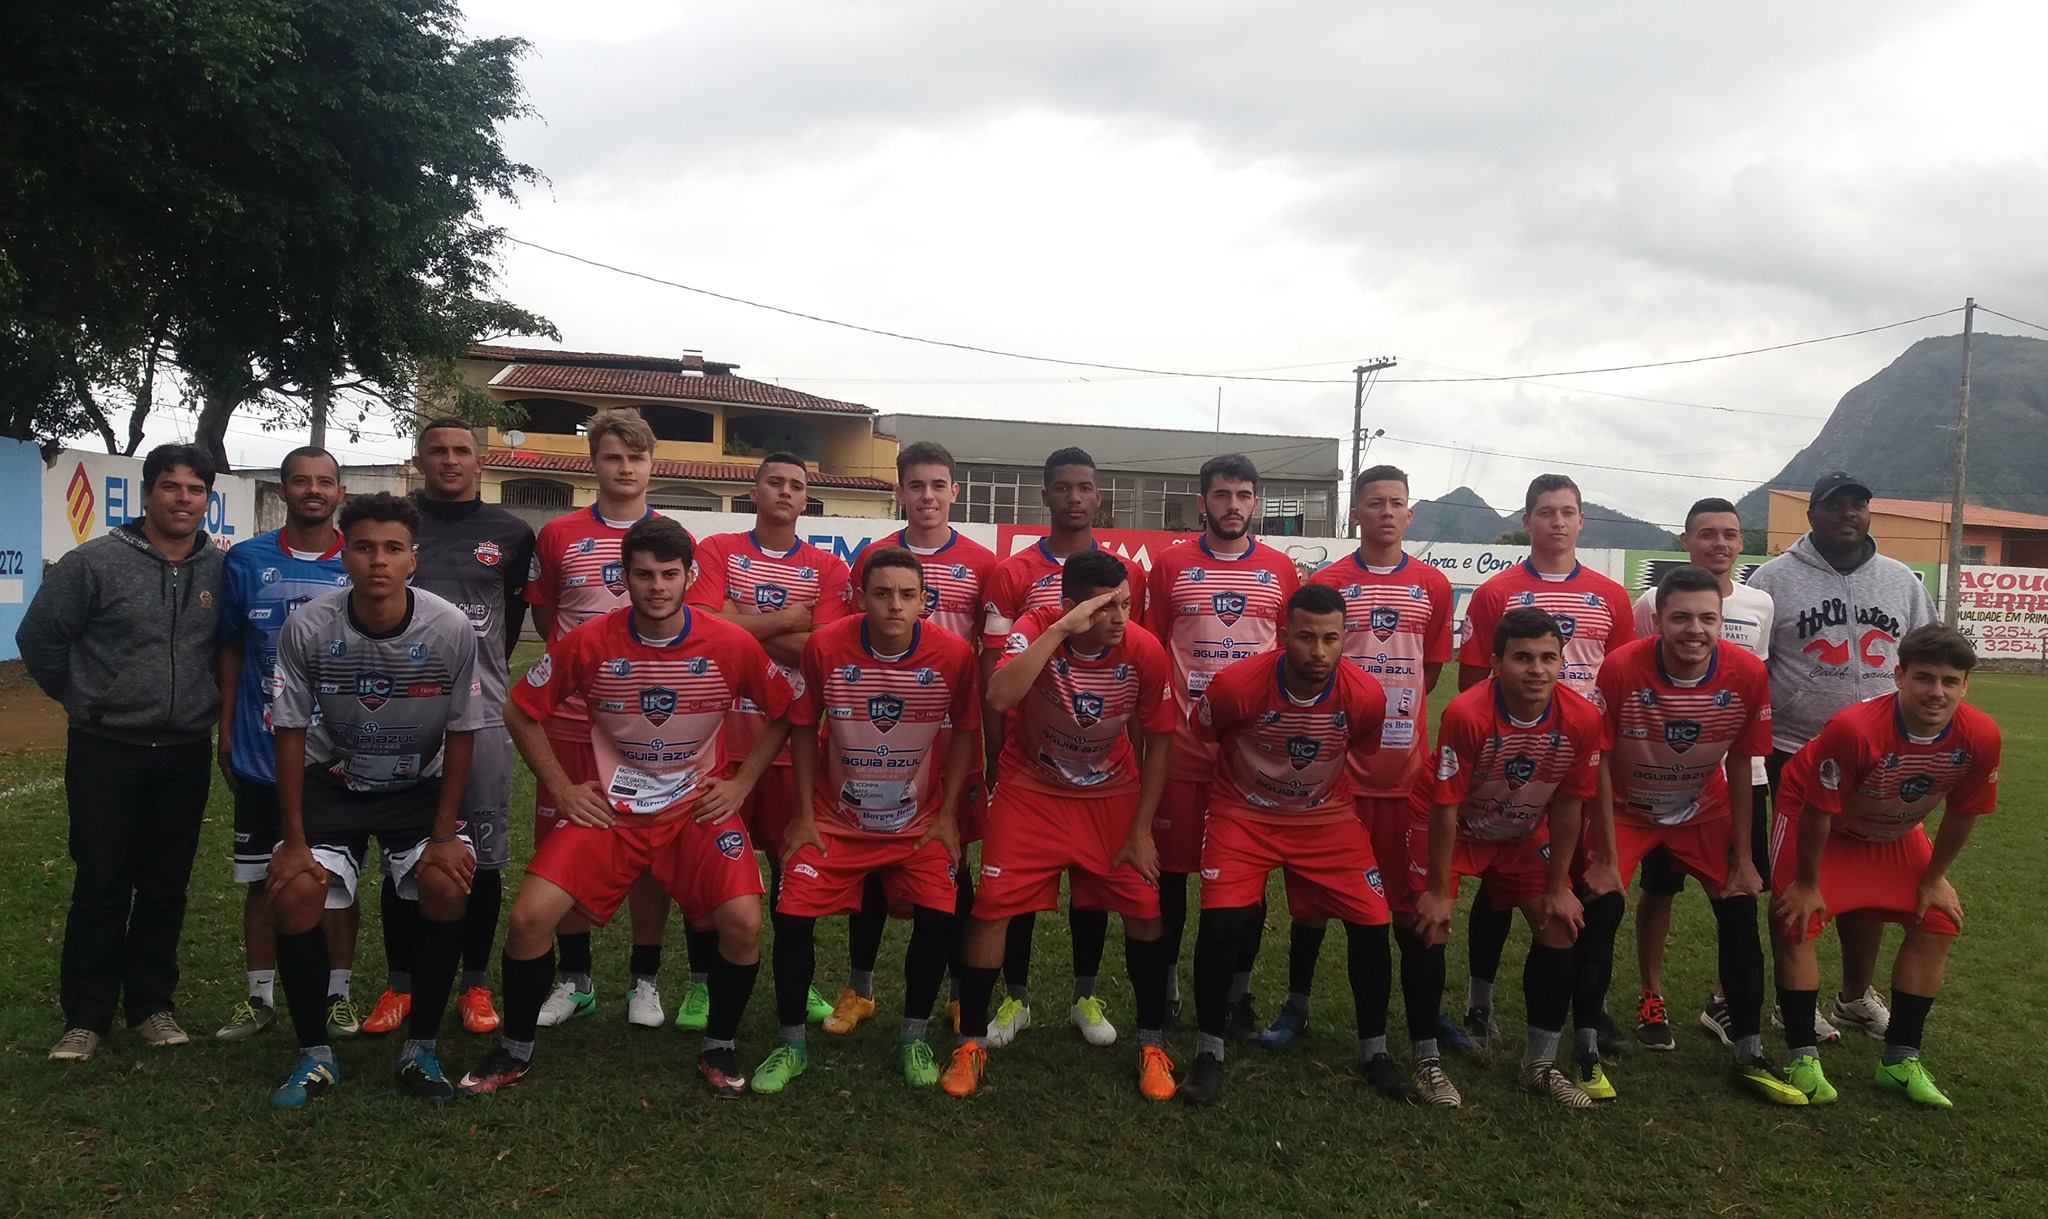 Iconha FC  enfrenta o Doze FC no KLEBER ANDRADE  neste domingo na Final do Campeonato CARIACIQUENSE SUB 20 DE 2017